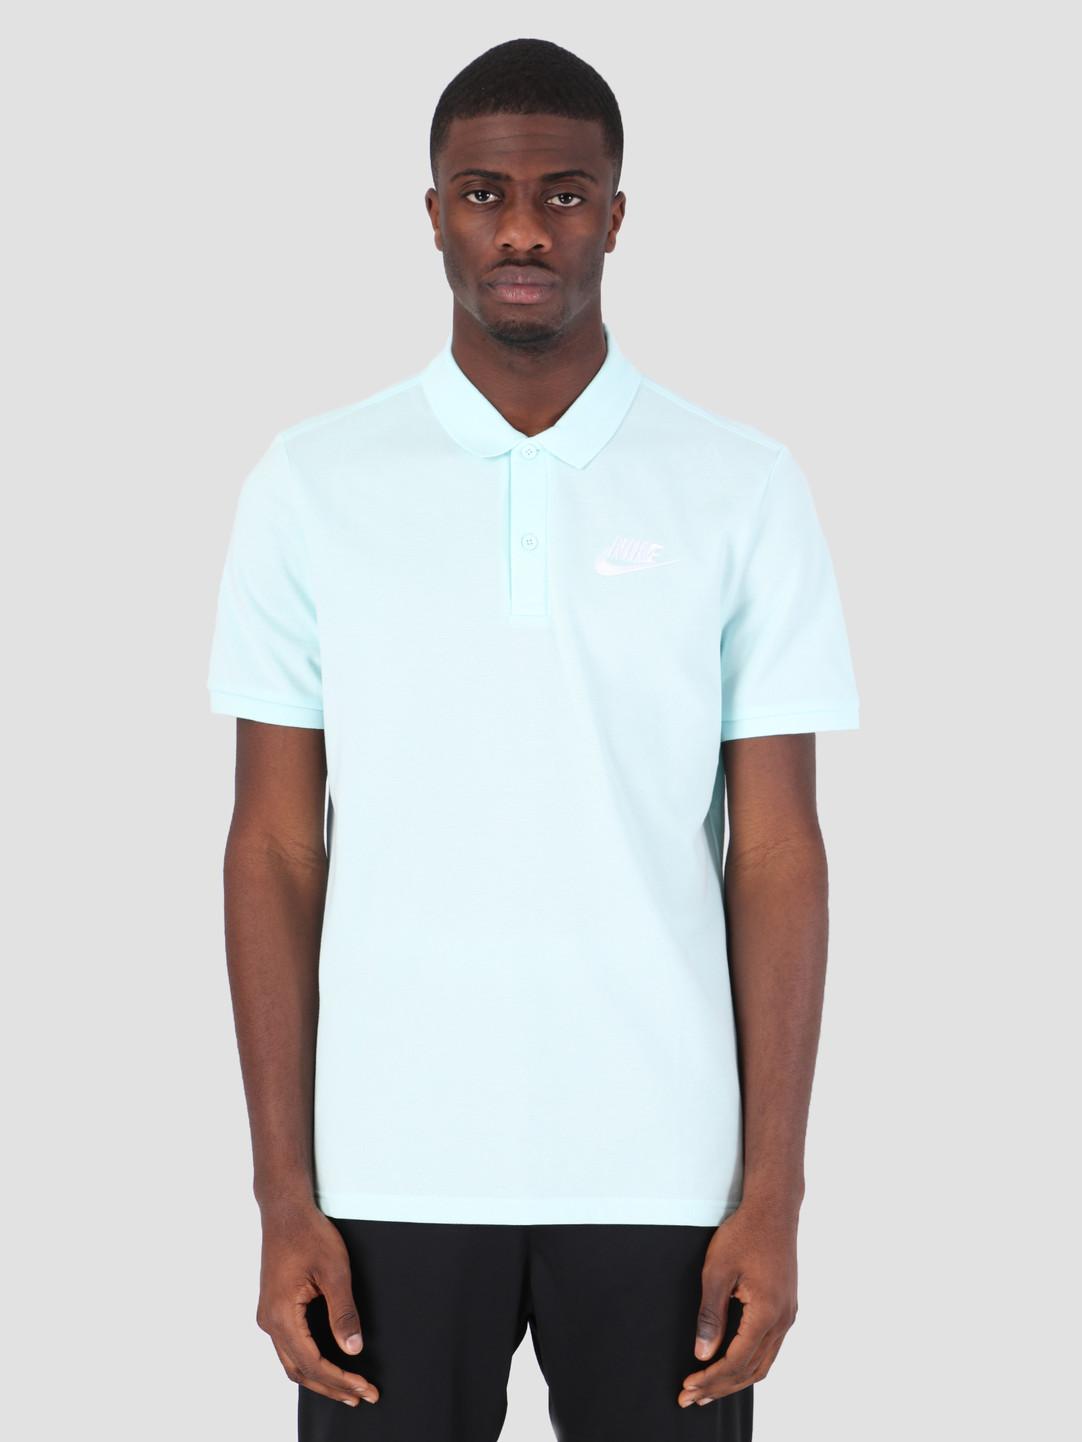 Nike Nike Sportswear Polo Teal Tint White 909746-337